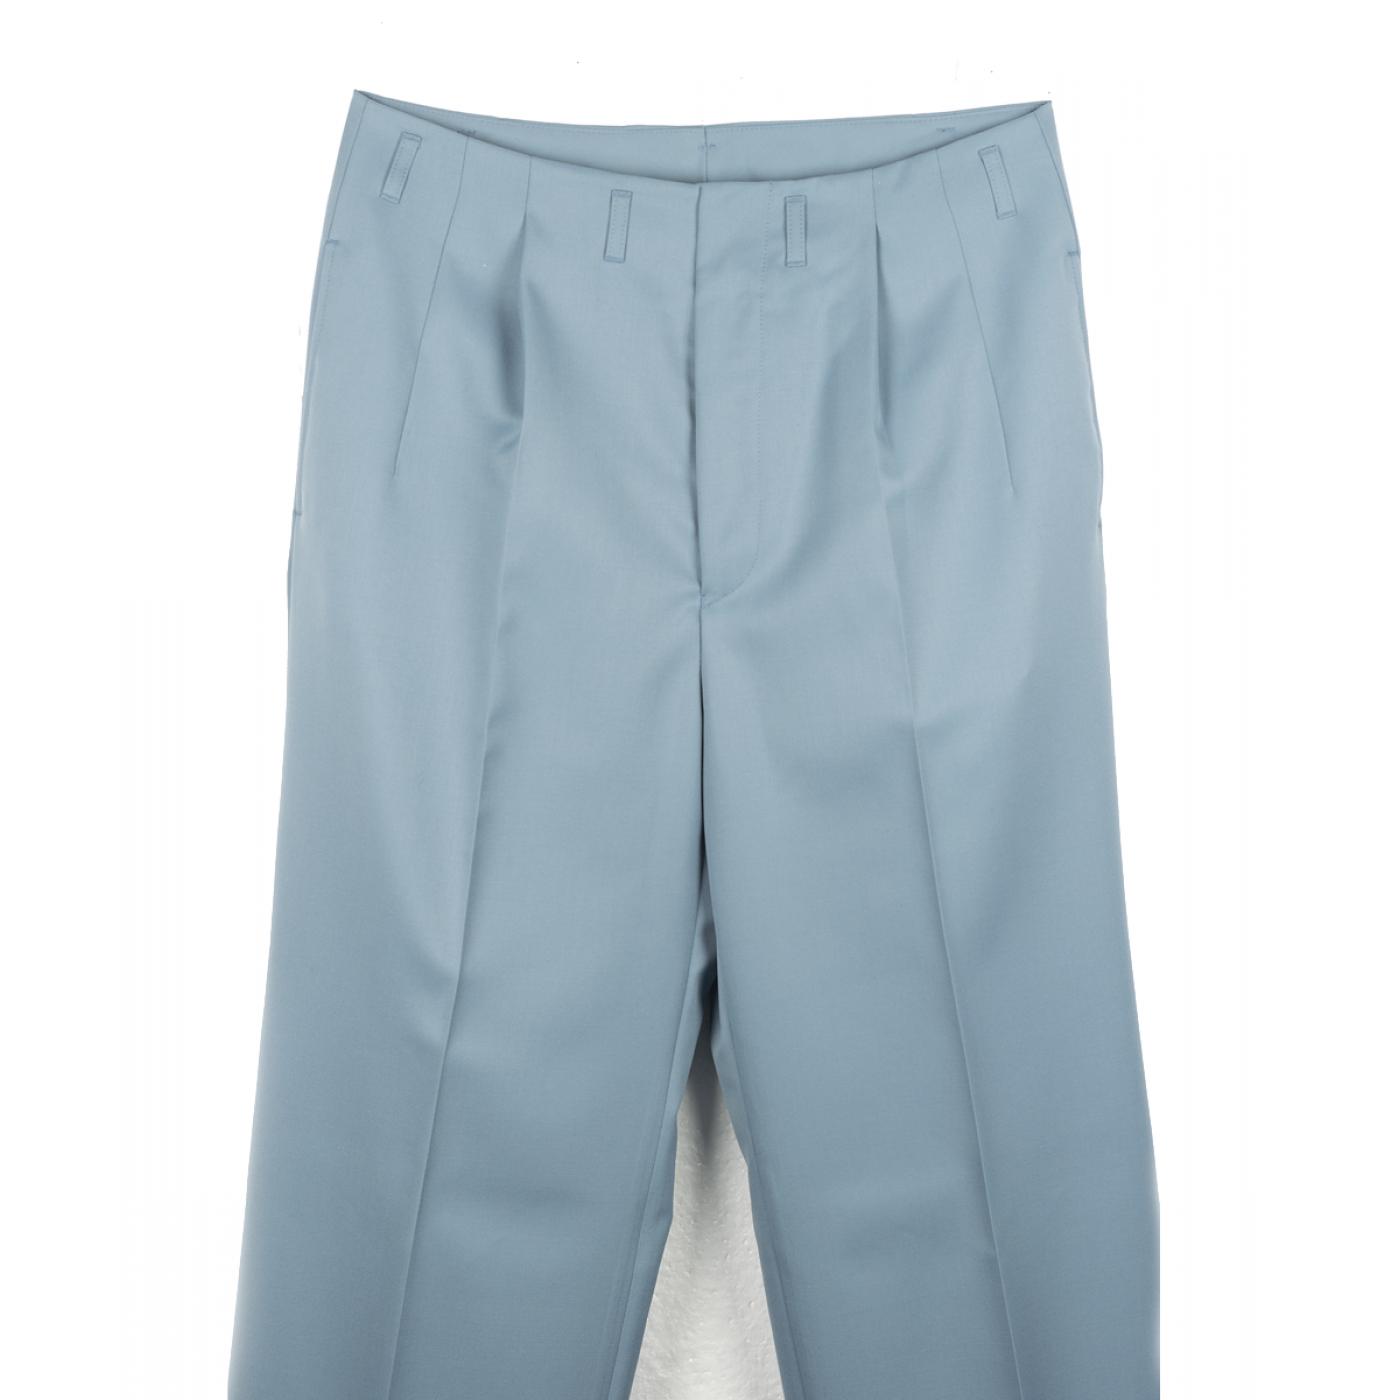 Light Blue Trousers